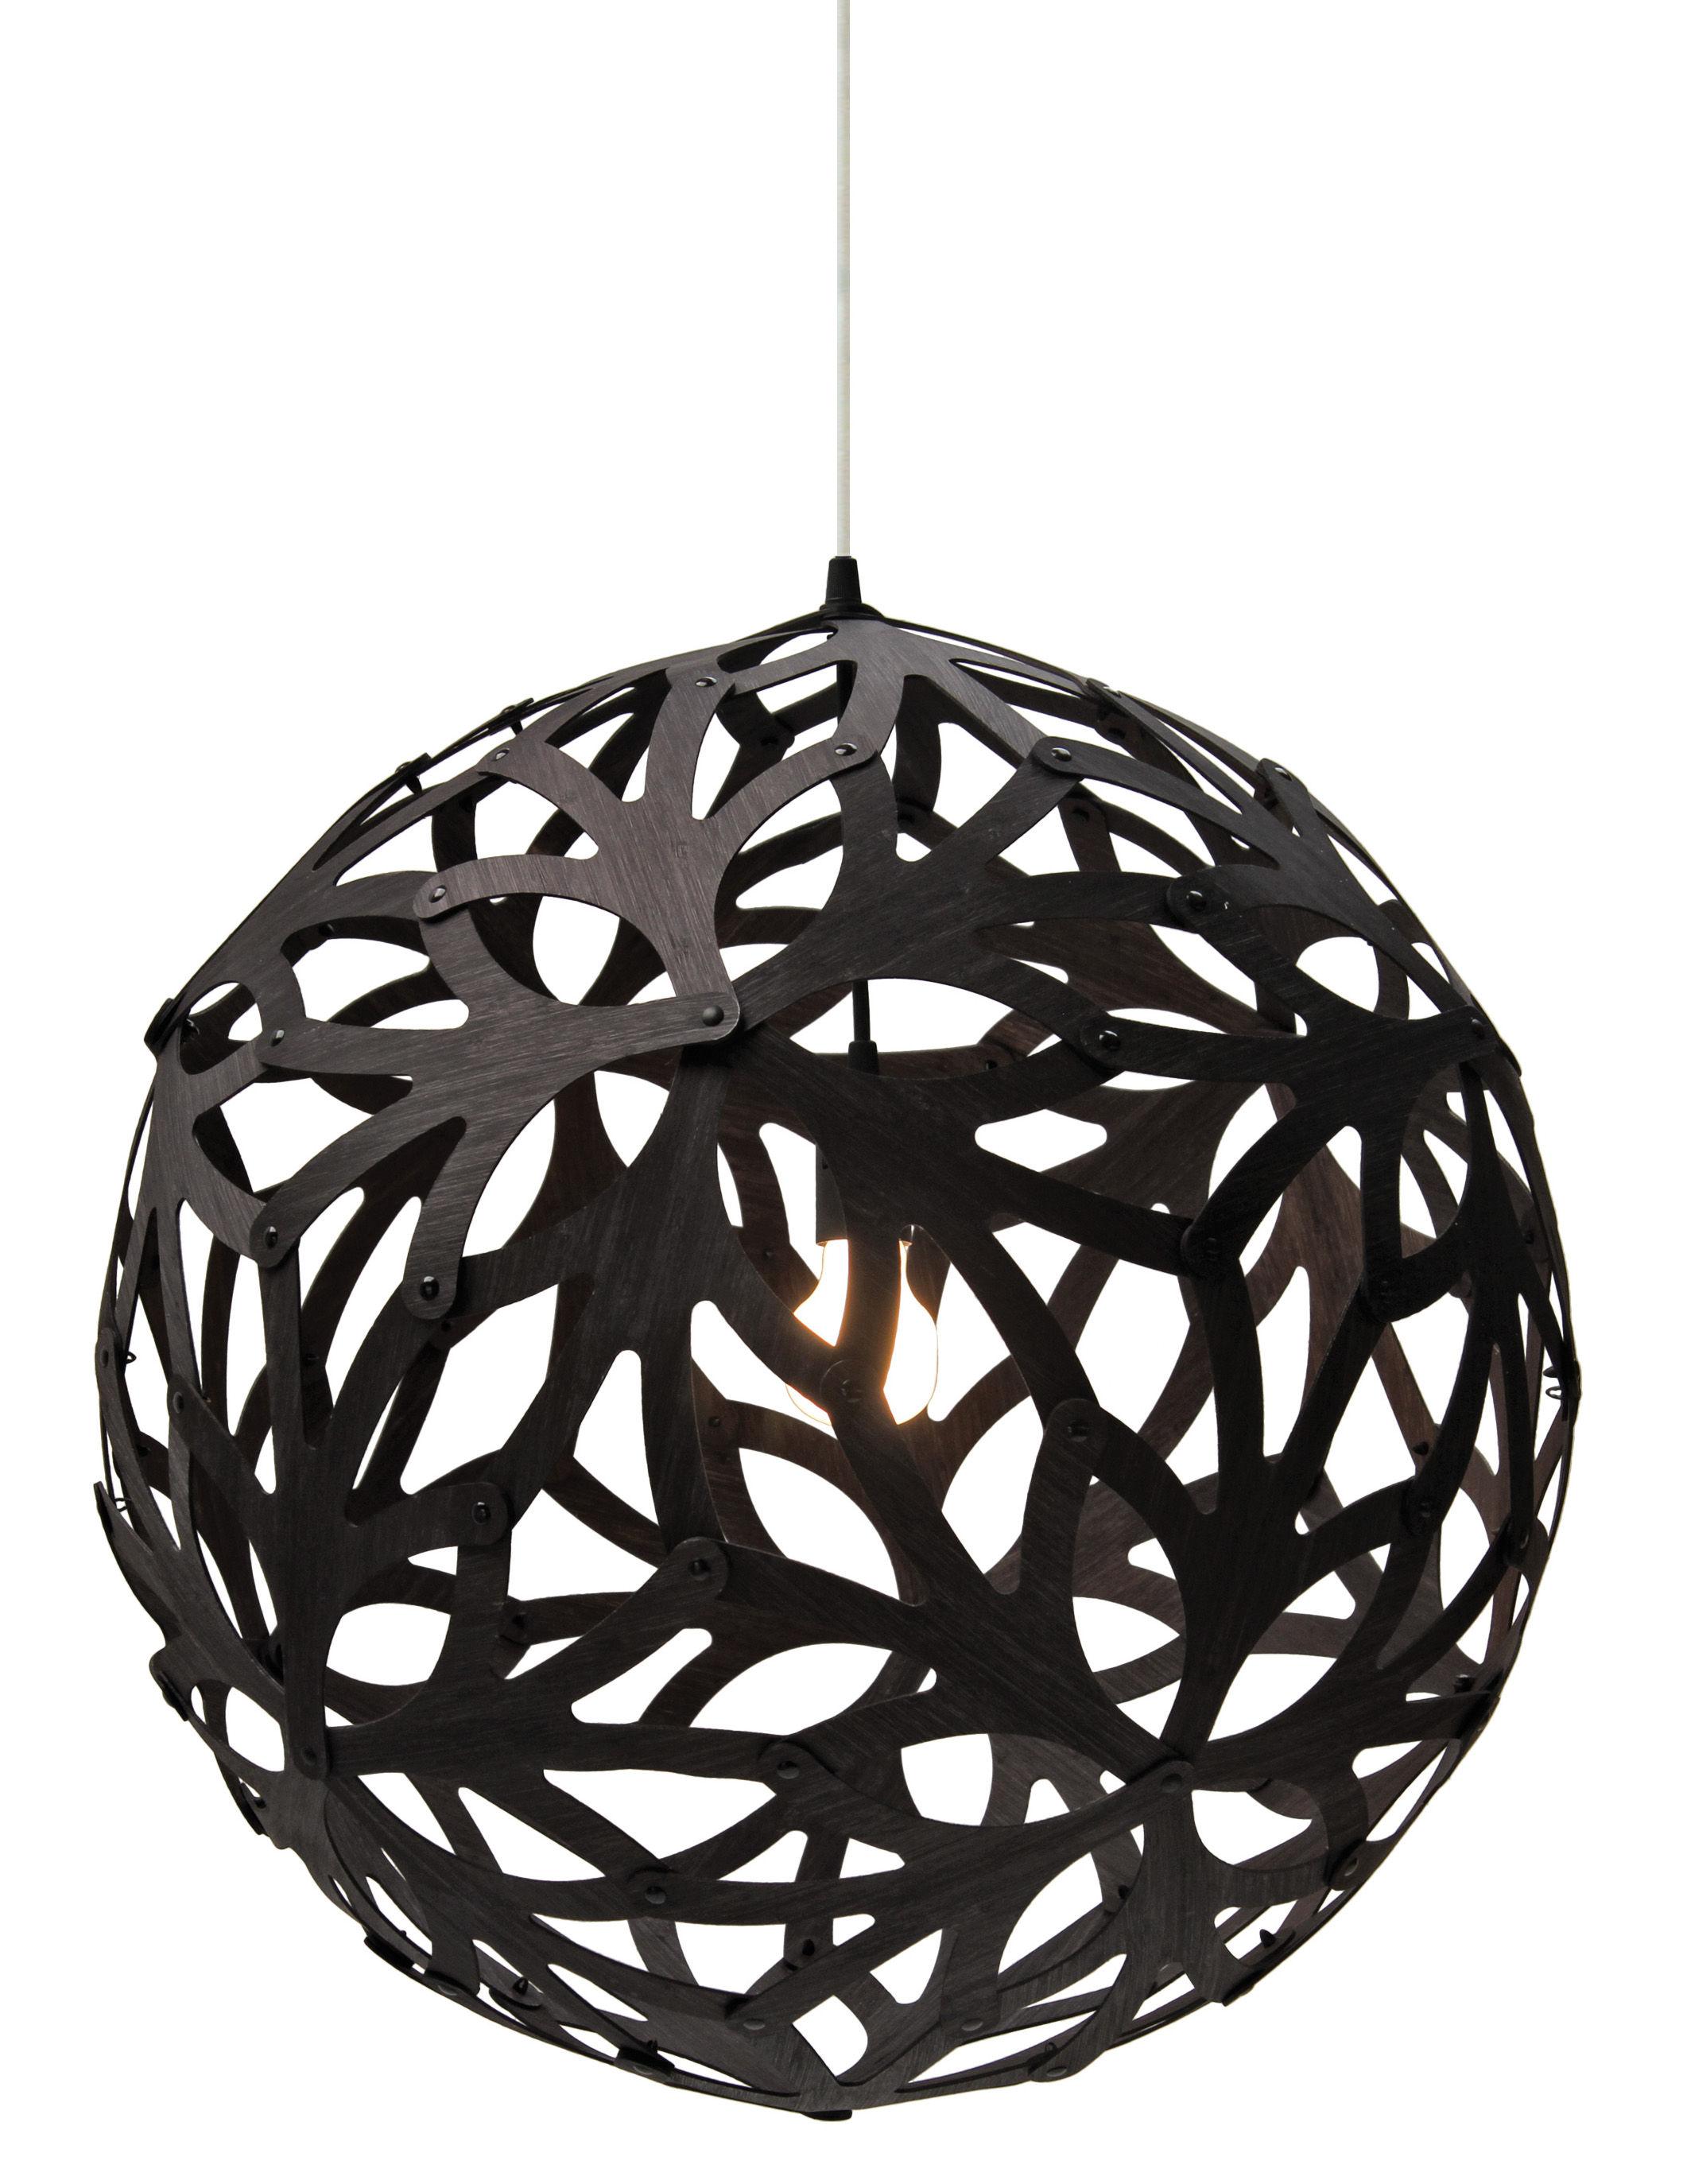 Lighting - Pendant Lighting - Floral Pendant - Ø 60 cm - Black by David Trubridge - Black - Pine